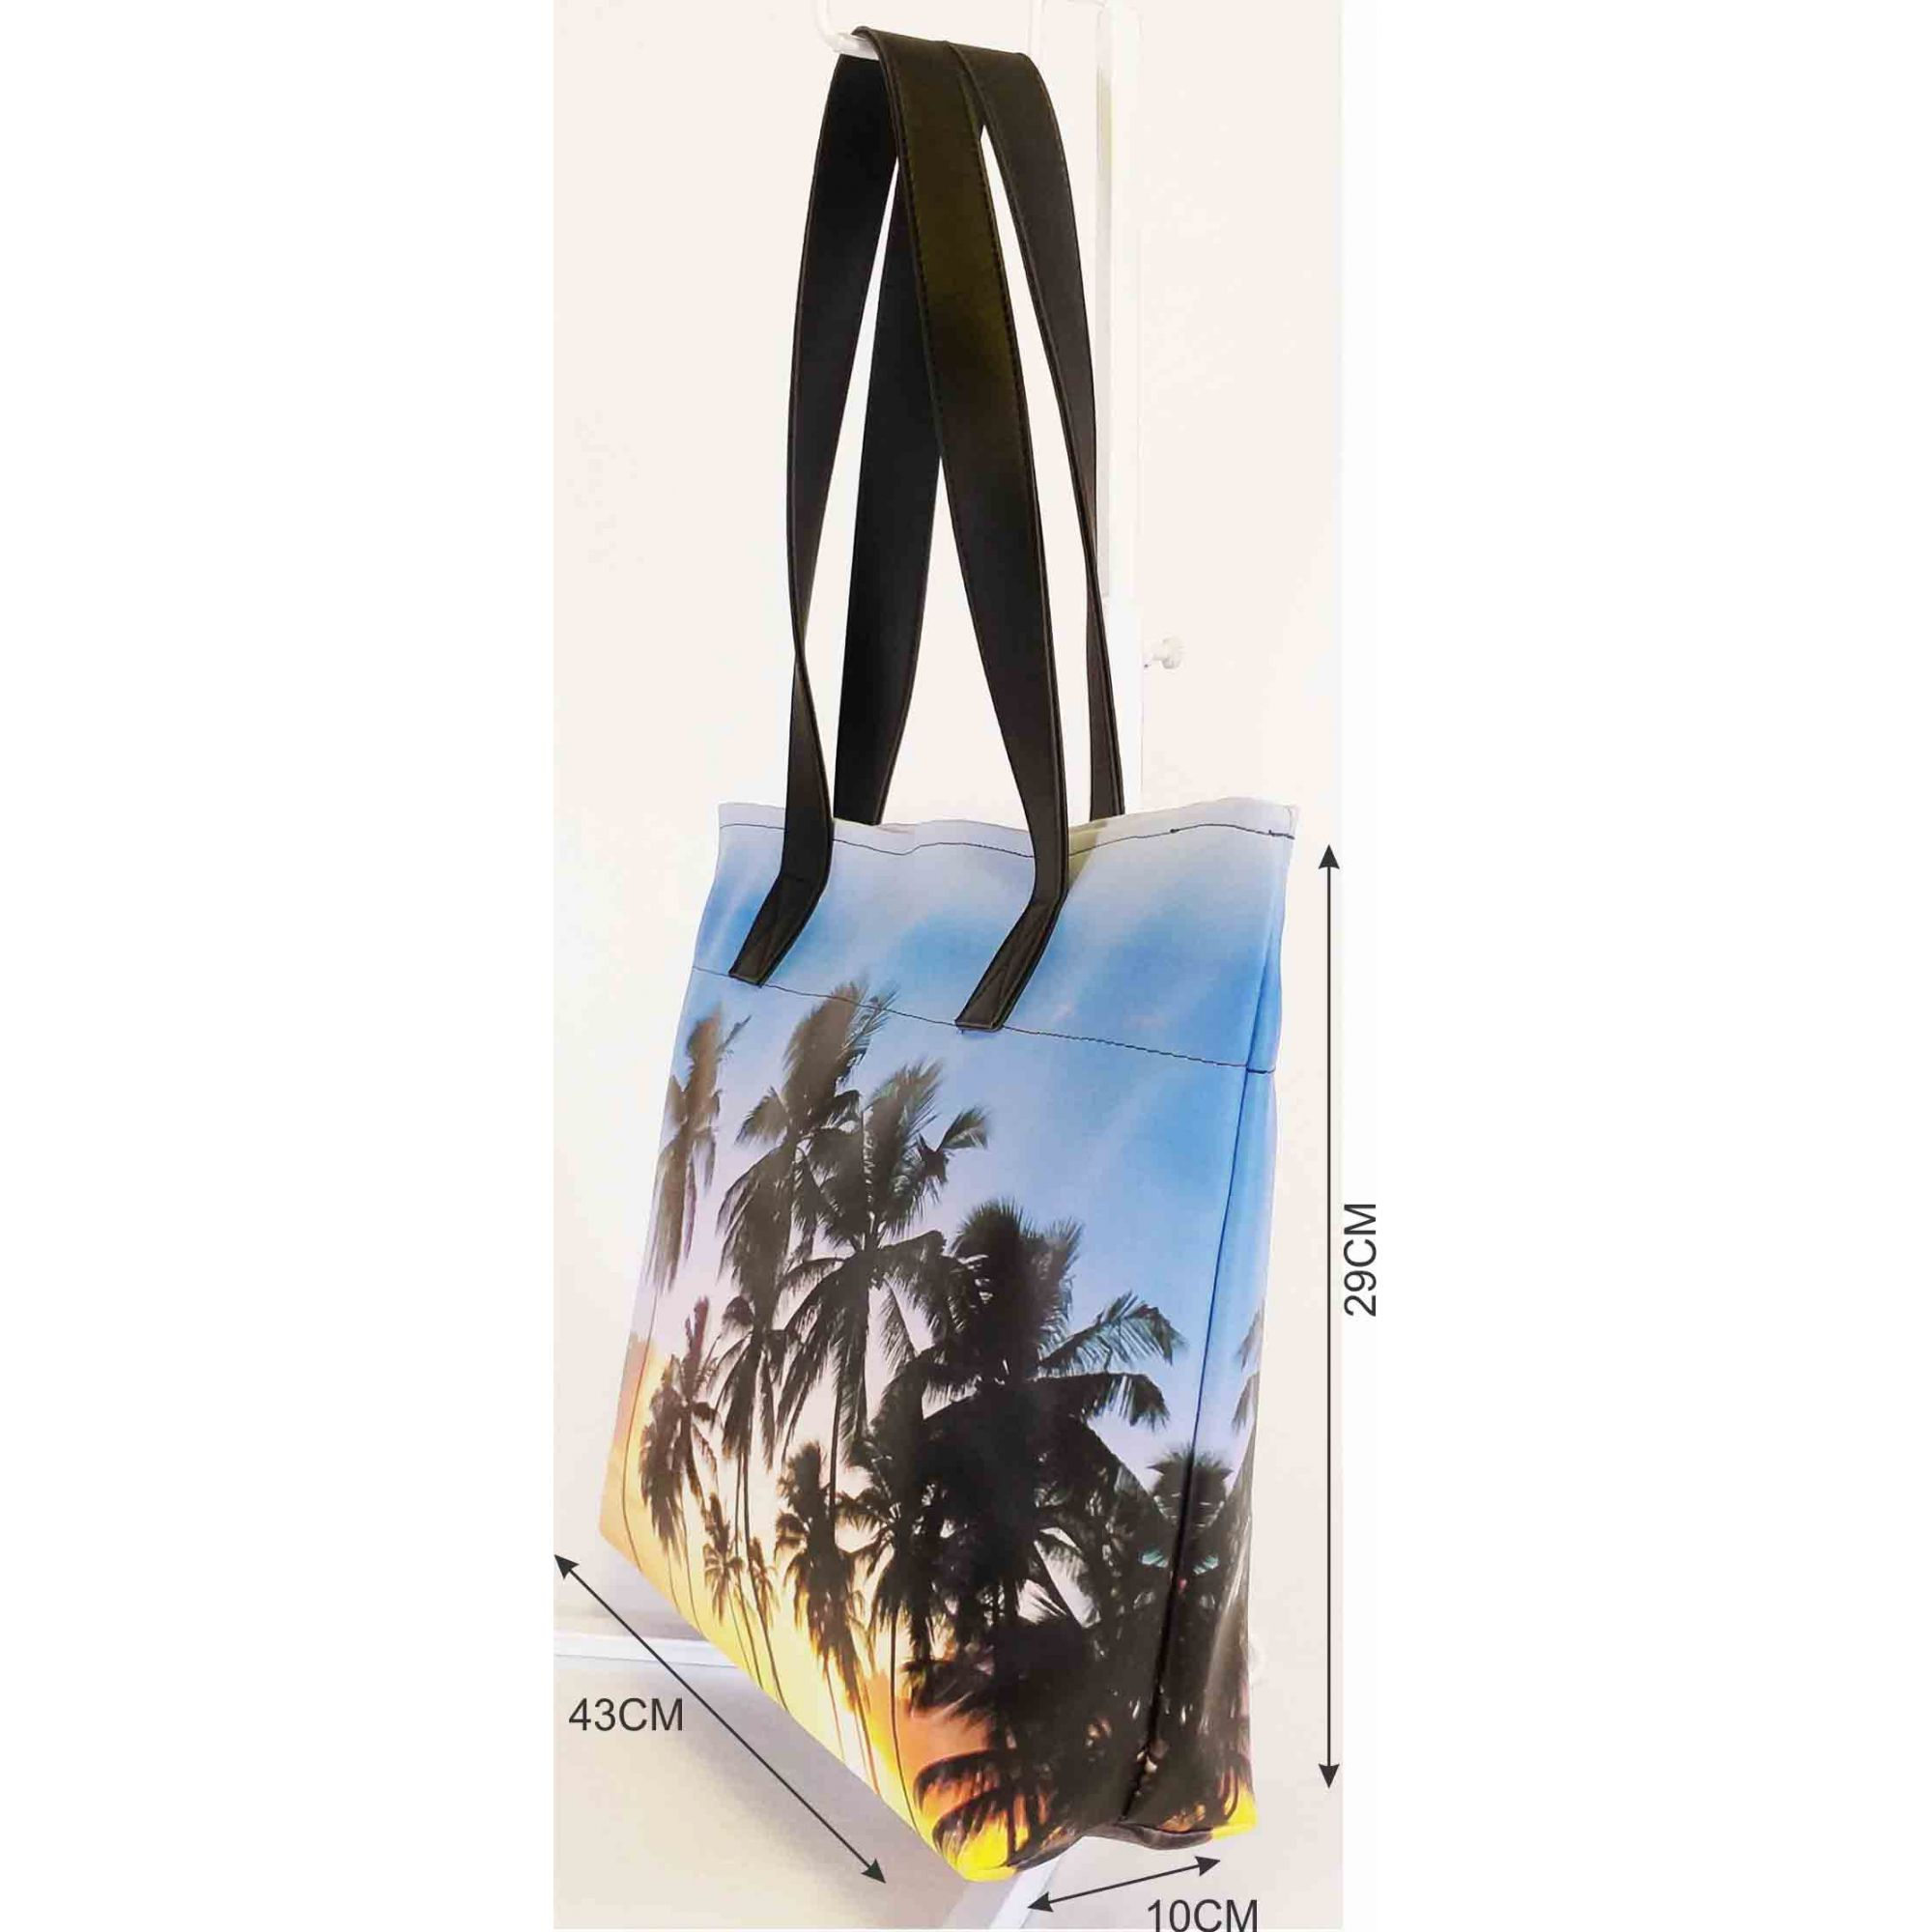 Bolsa Praia Feminina Coqueiros, Magicc Bolsas